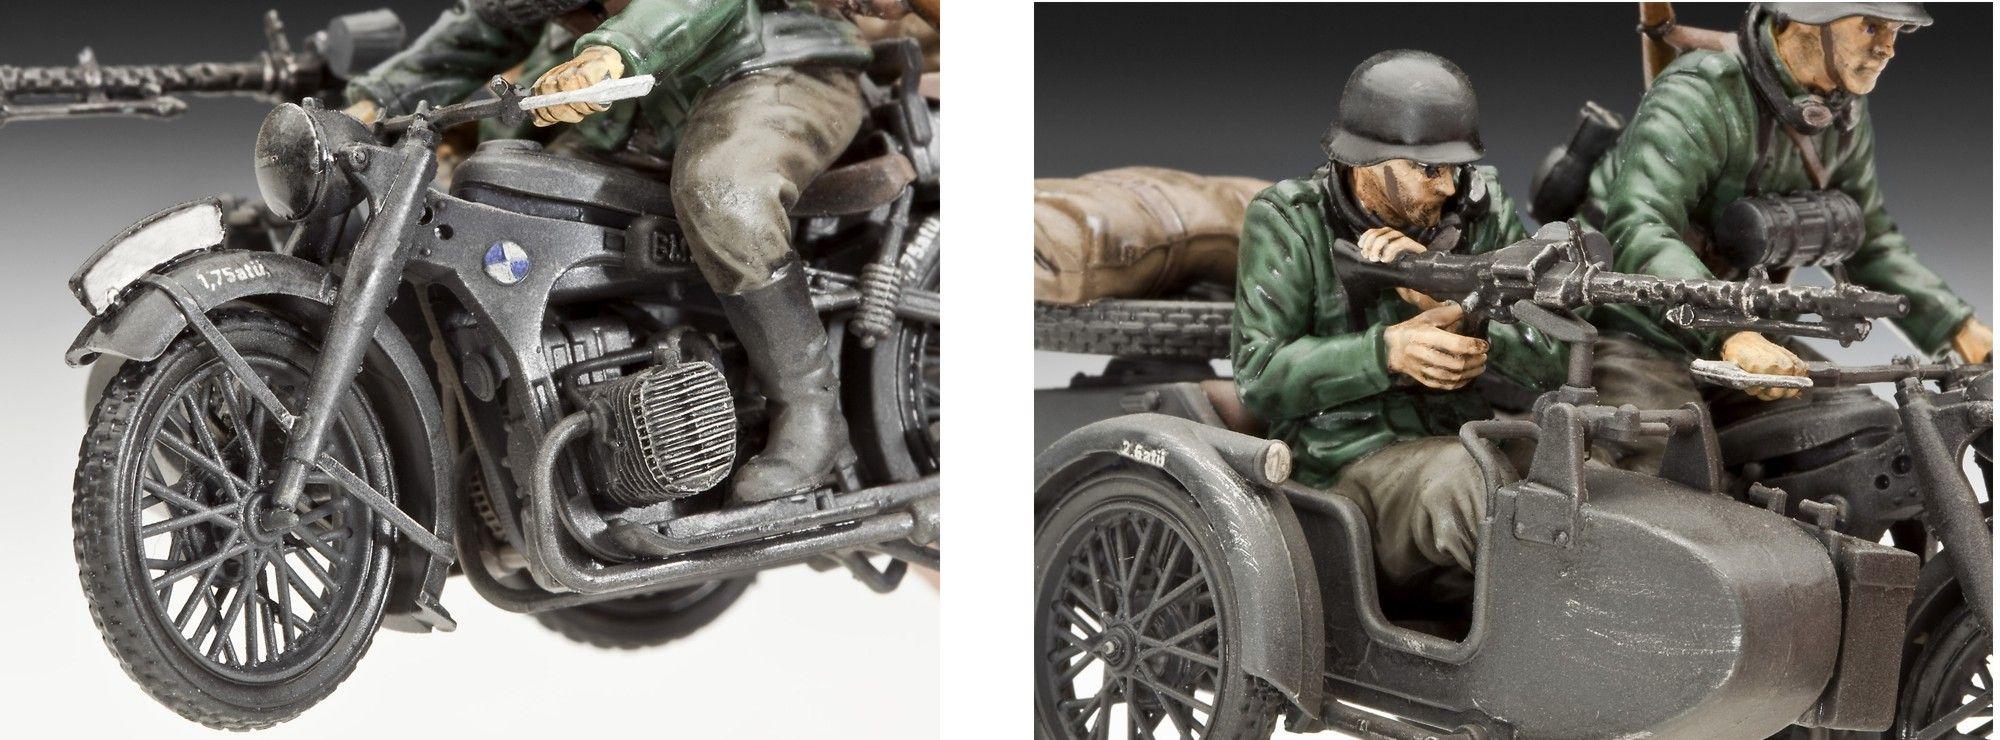 ausverkauft revell 03090 motorrad mit beiwagen r 12. Black Bedroom Furniture Sets. Home Design Ideas